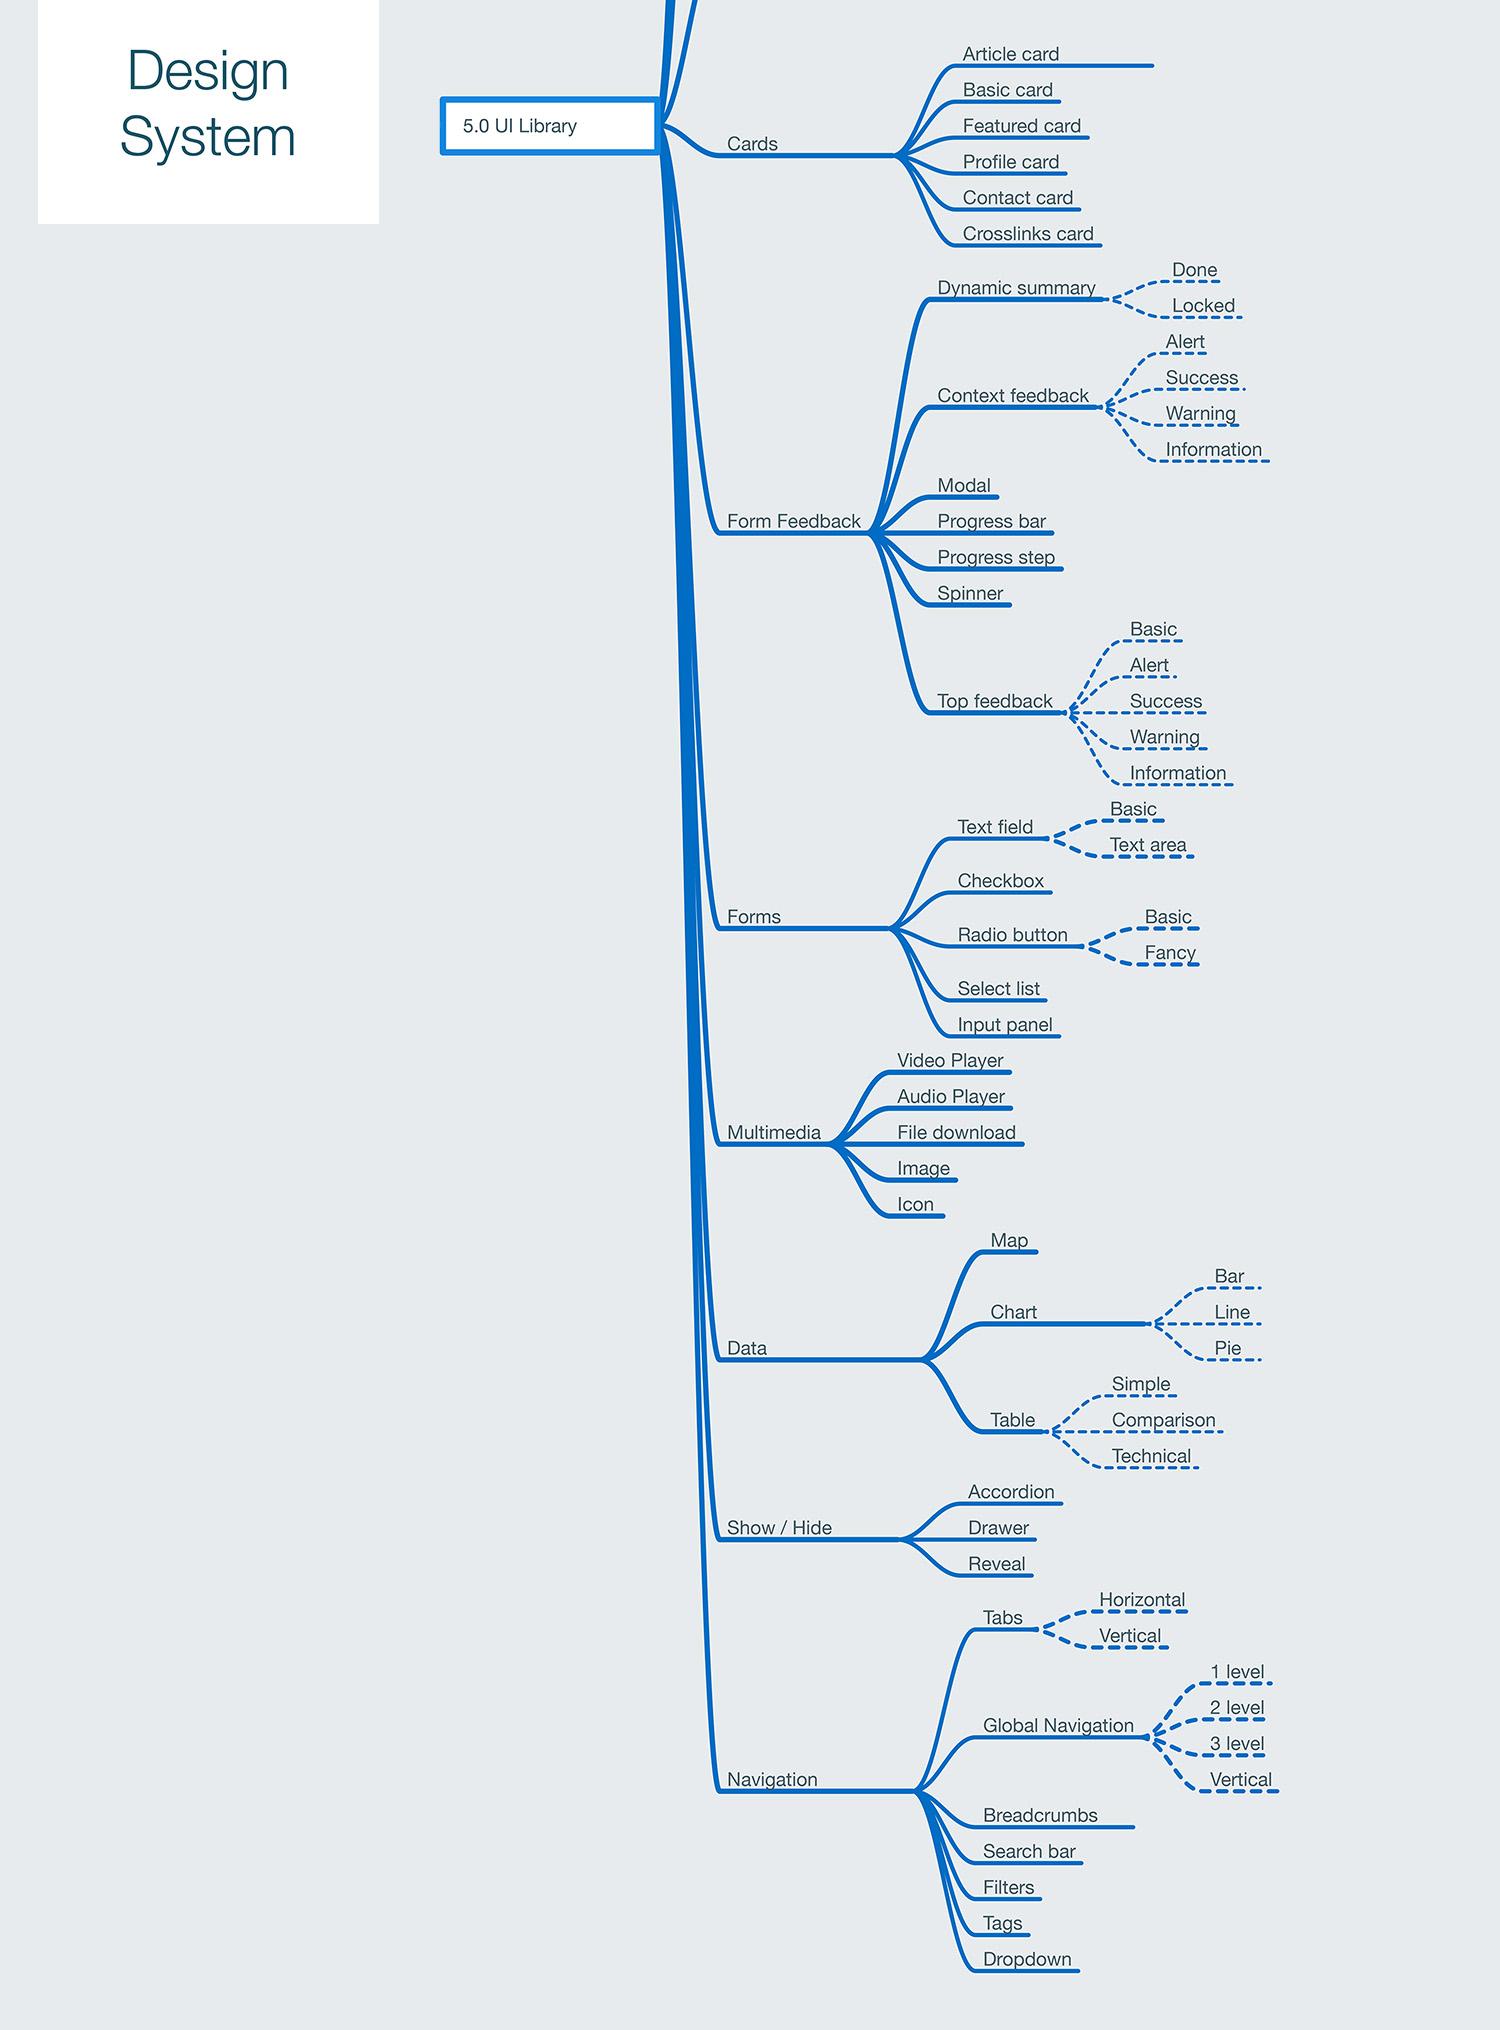 IA - Design System - B.jpg